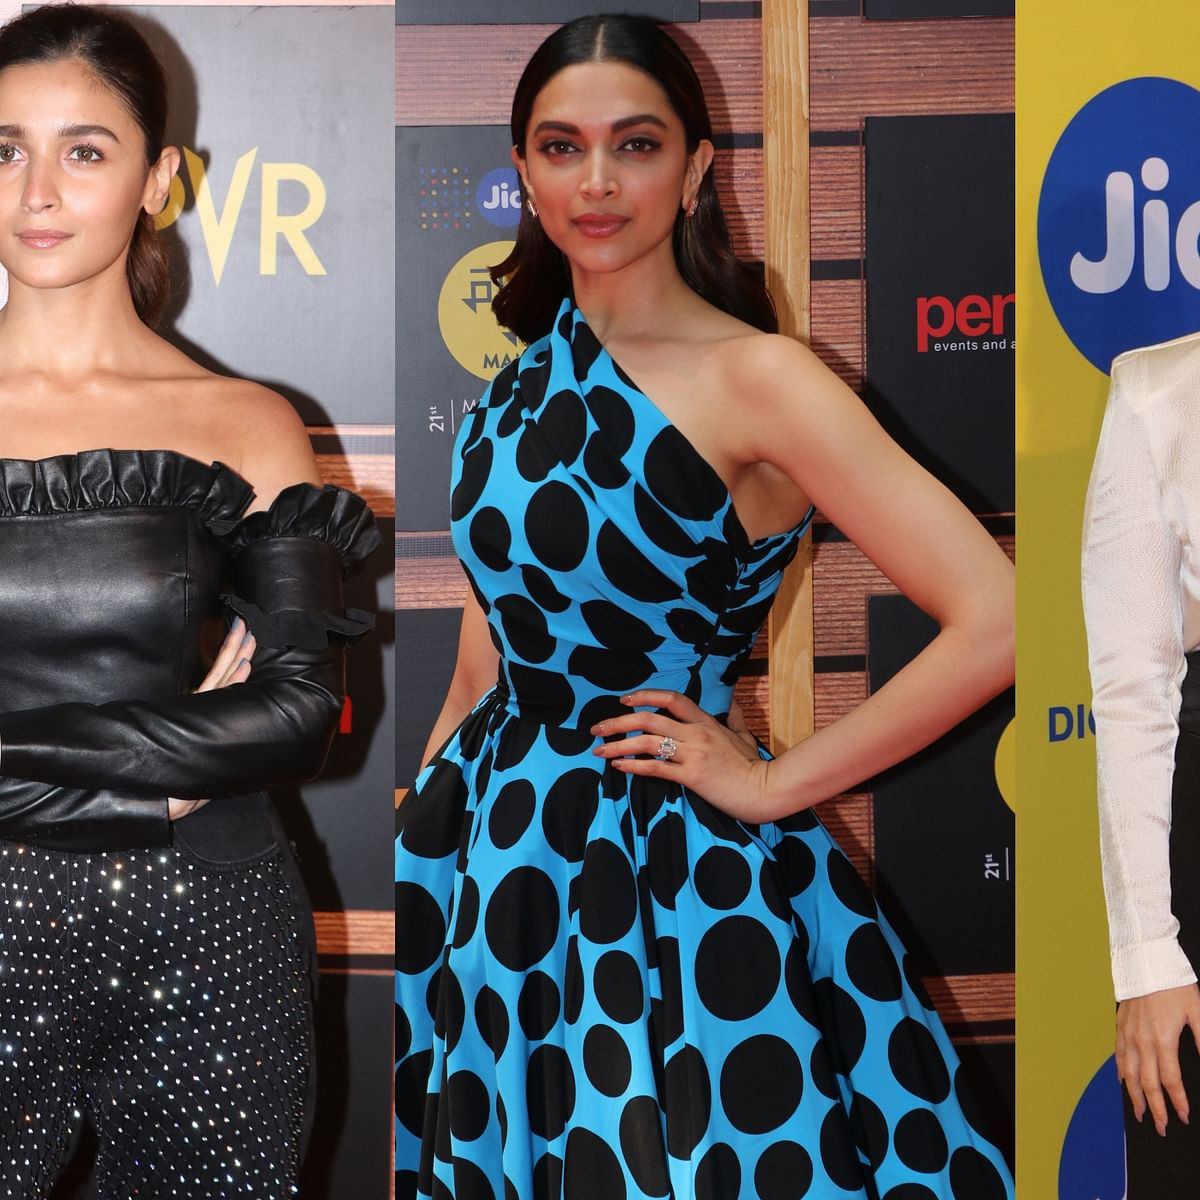 MAMI Festival 2019: Deepika Padukone, Kareena Kapoor, other B-town celebs slay on red carpet